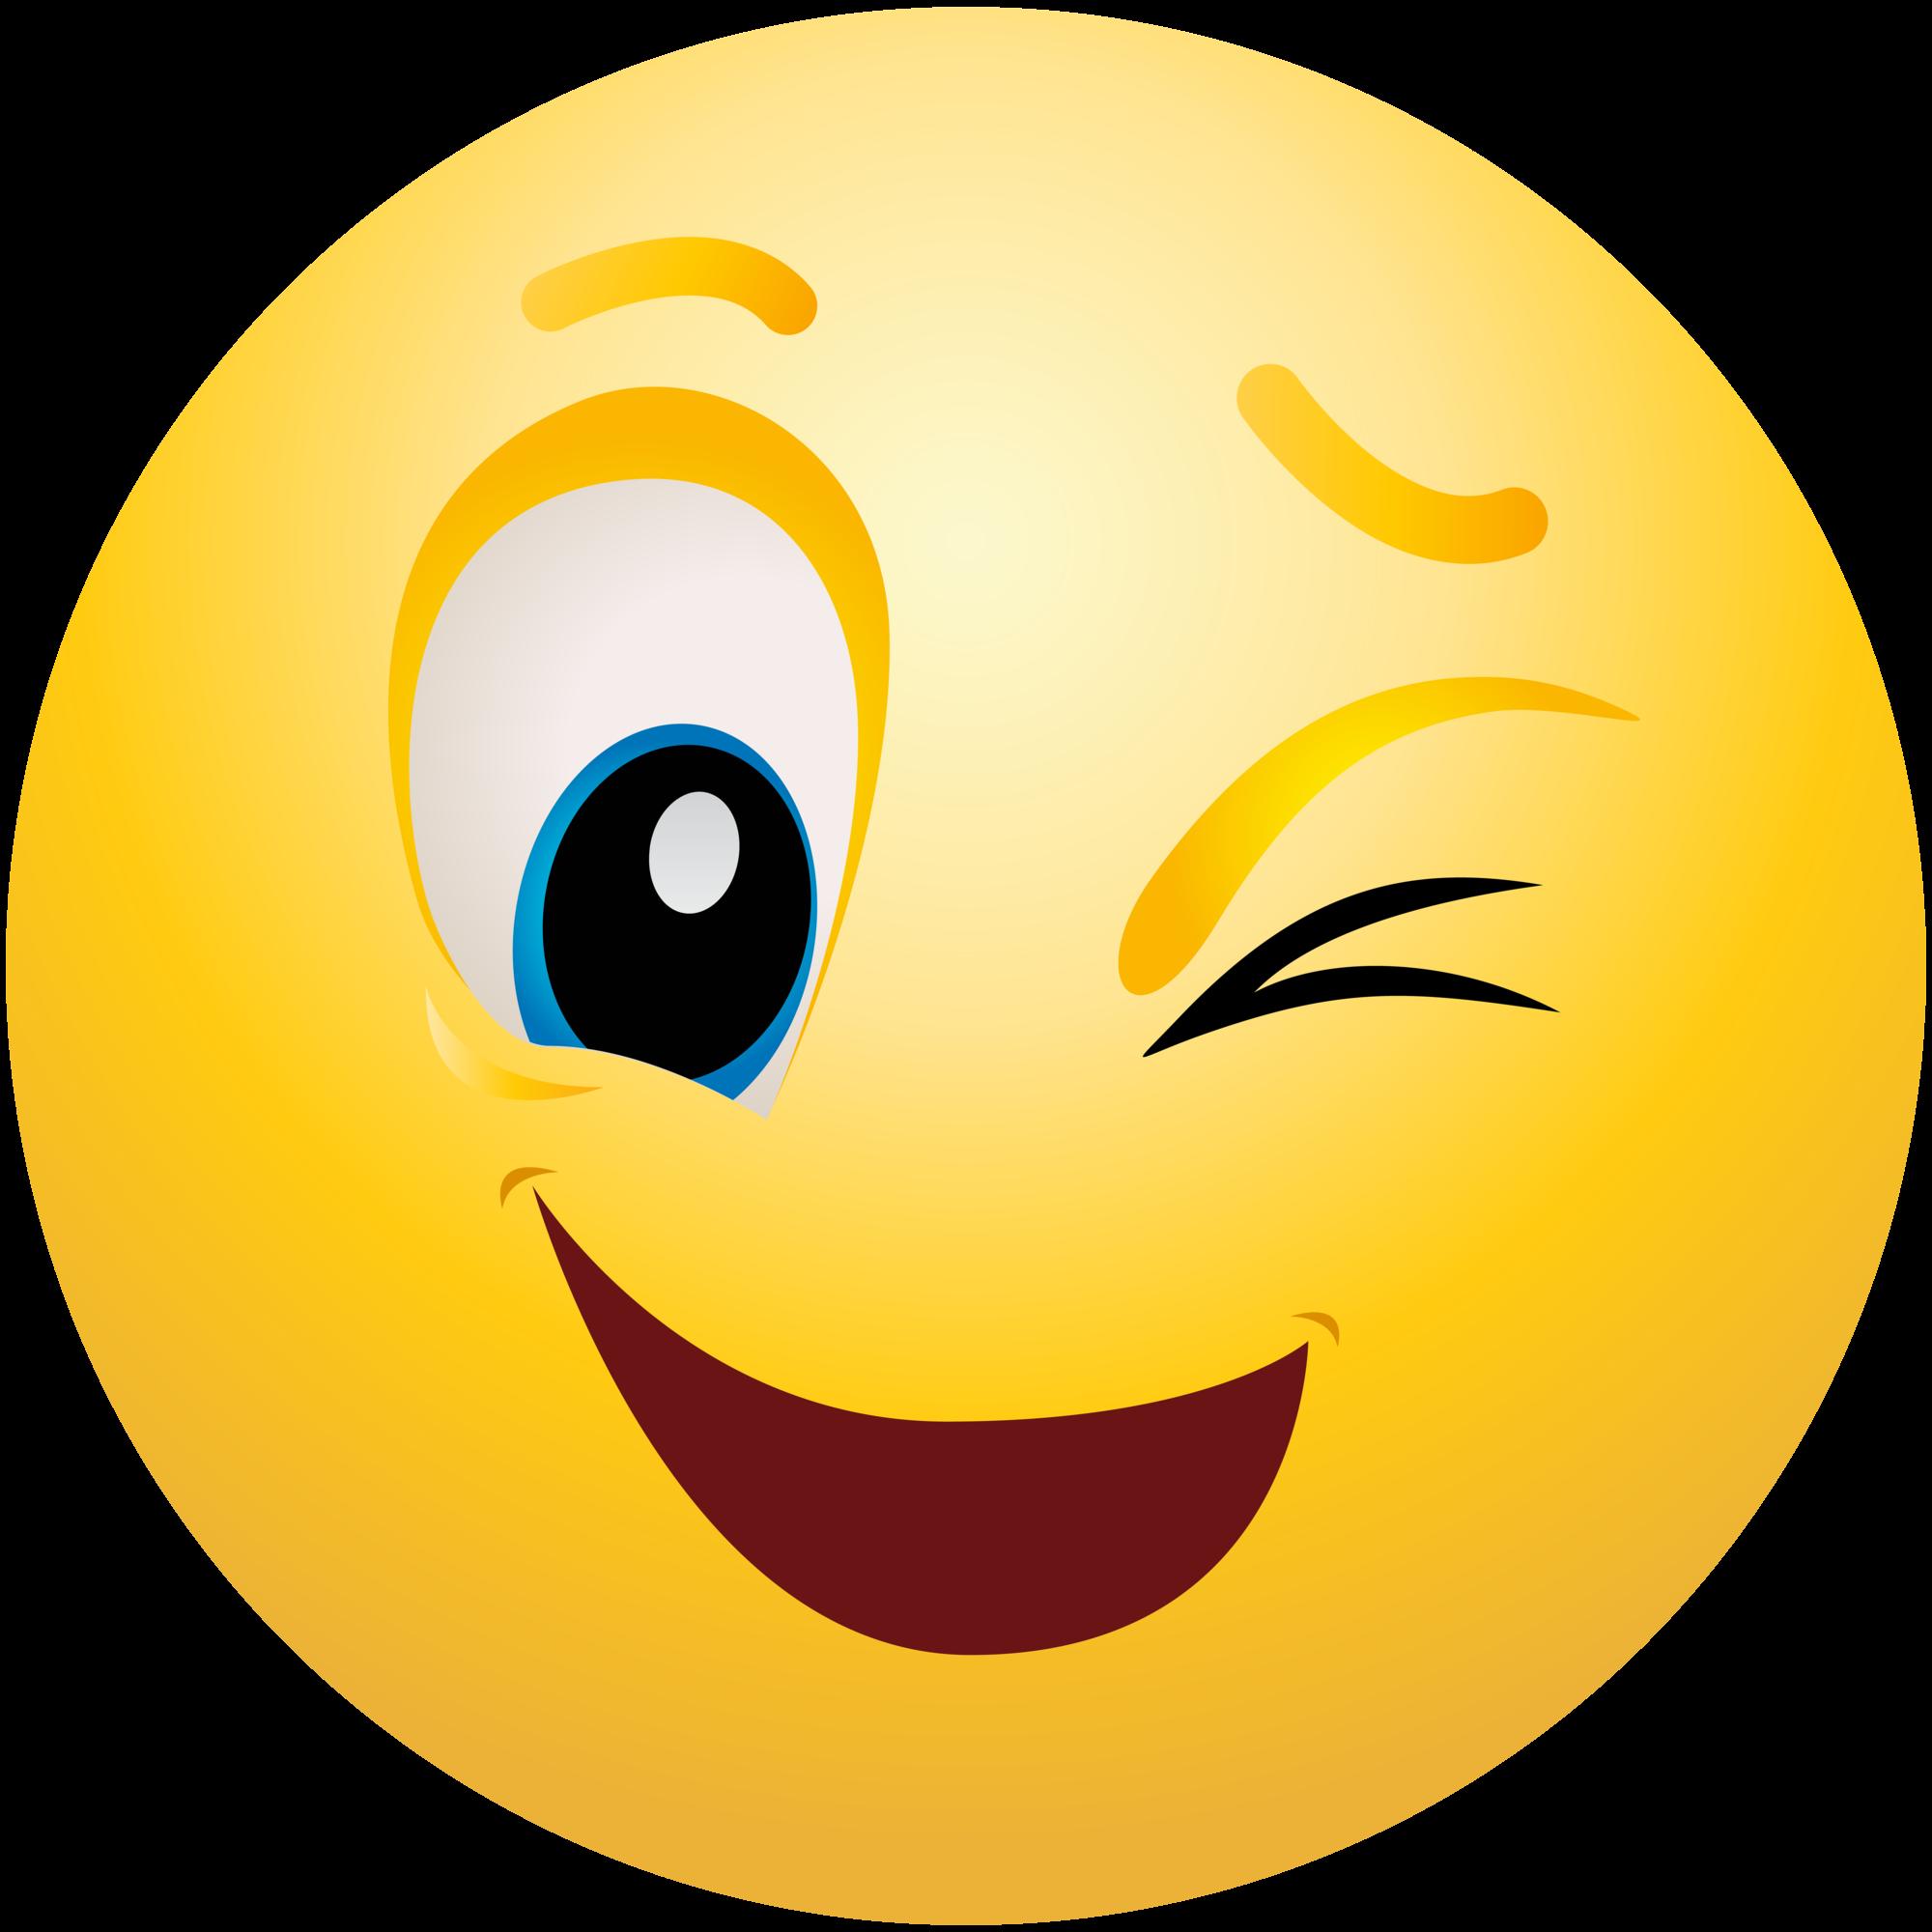 winking emoticon emoji clipart info rh clipart info emoticons clipart free emotion clipart